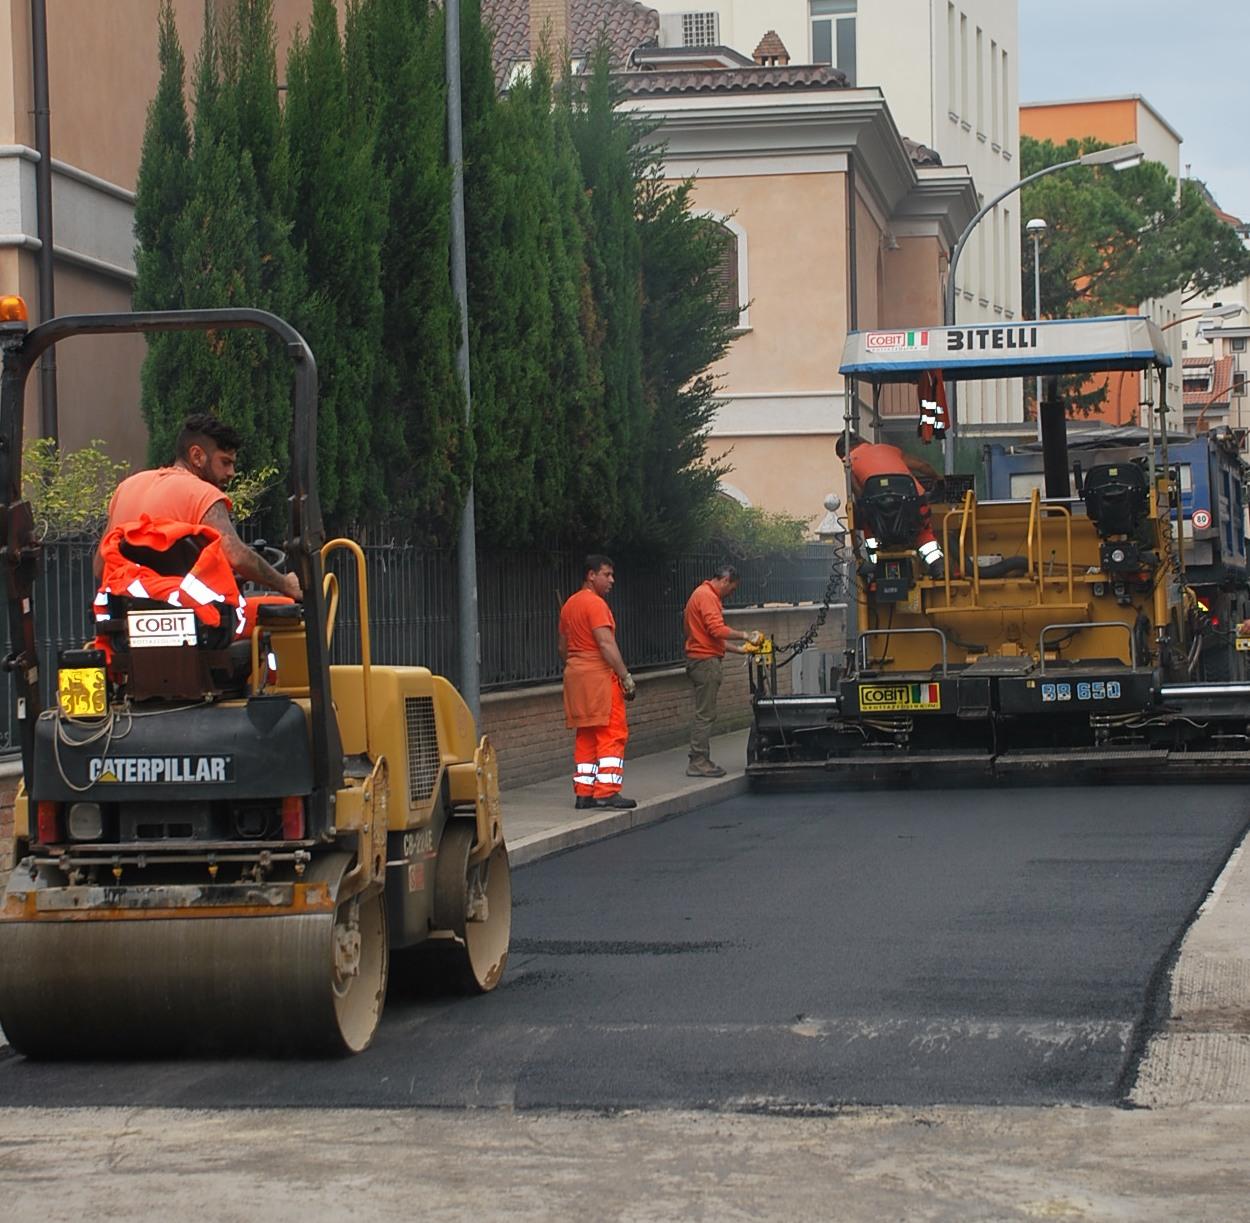 Via Bianchi, arrivano nuovi asfalti